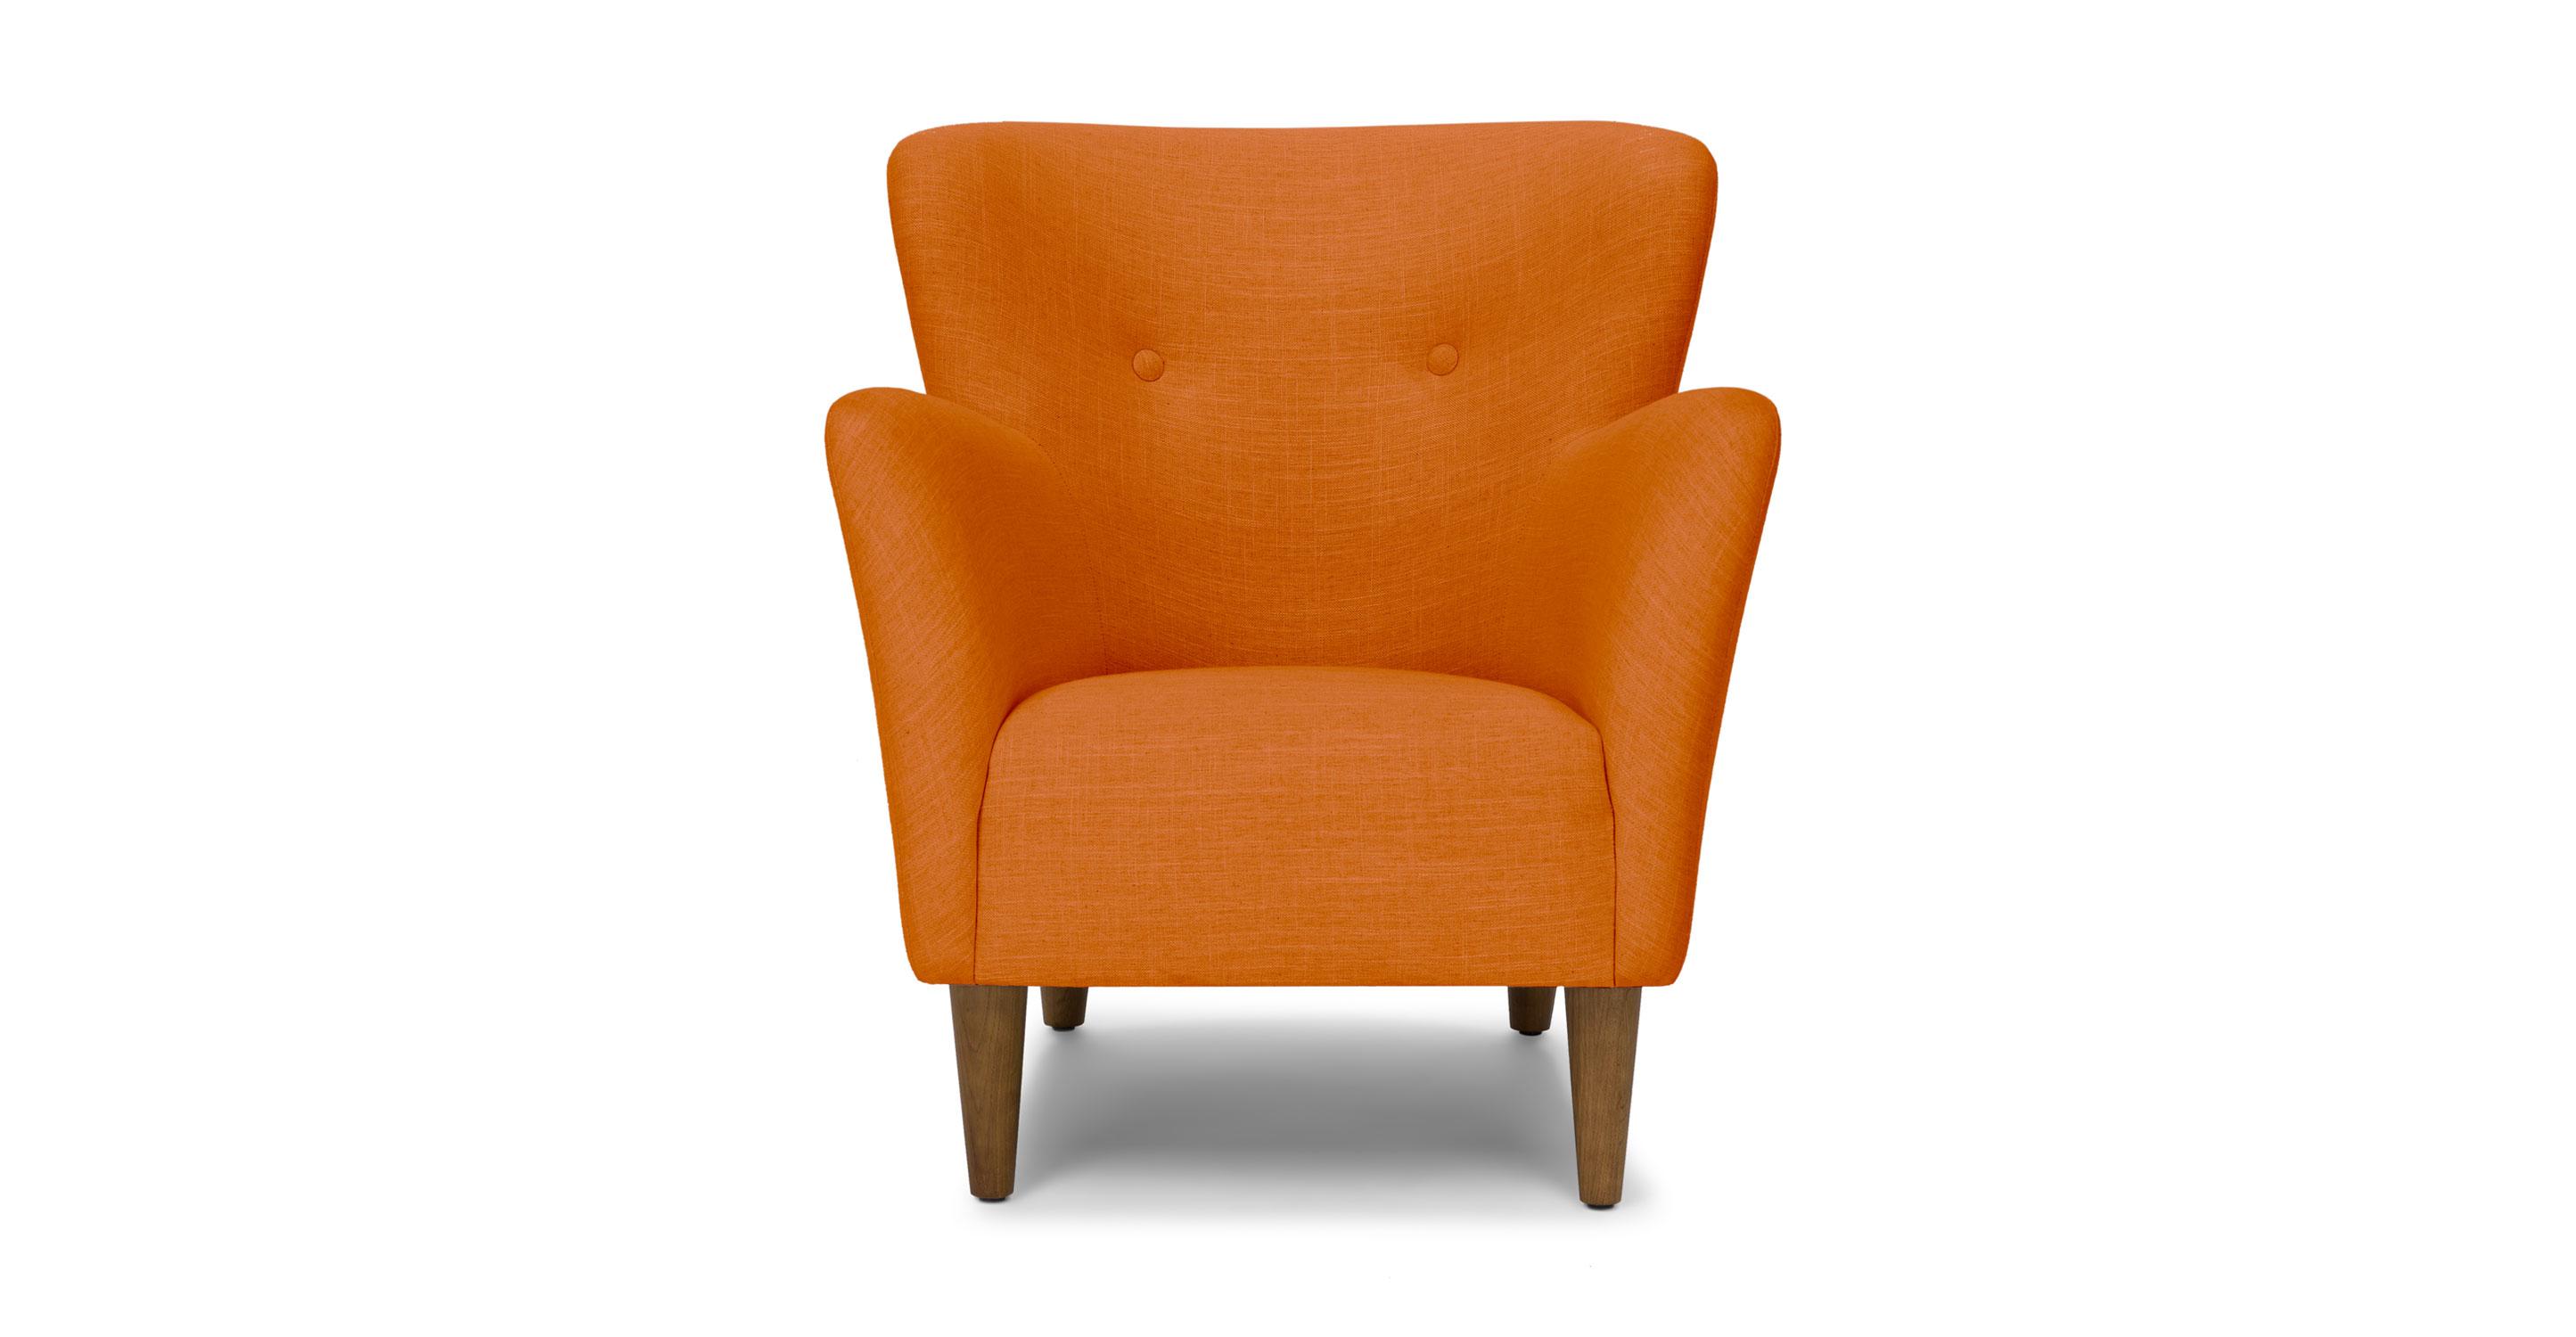 Happy Papaya Orange Armchair Lounge Chairs Article